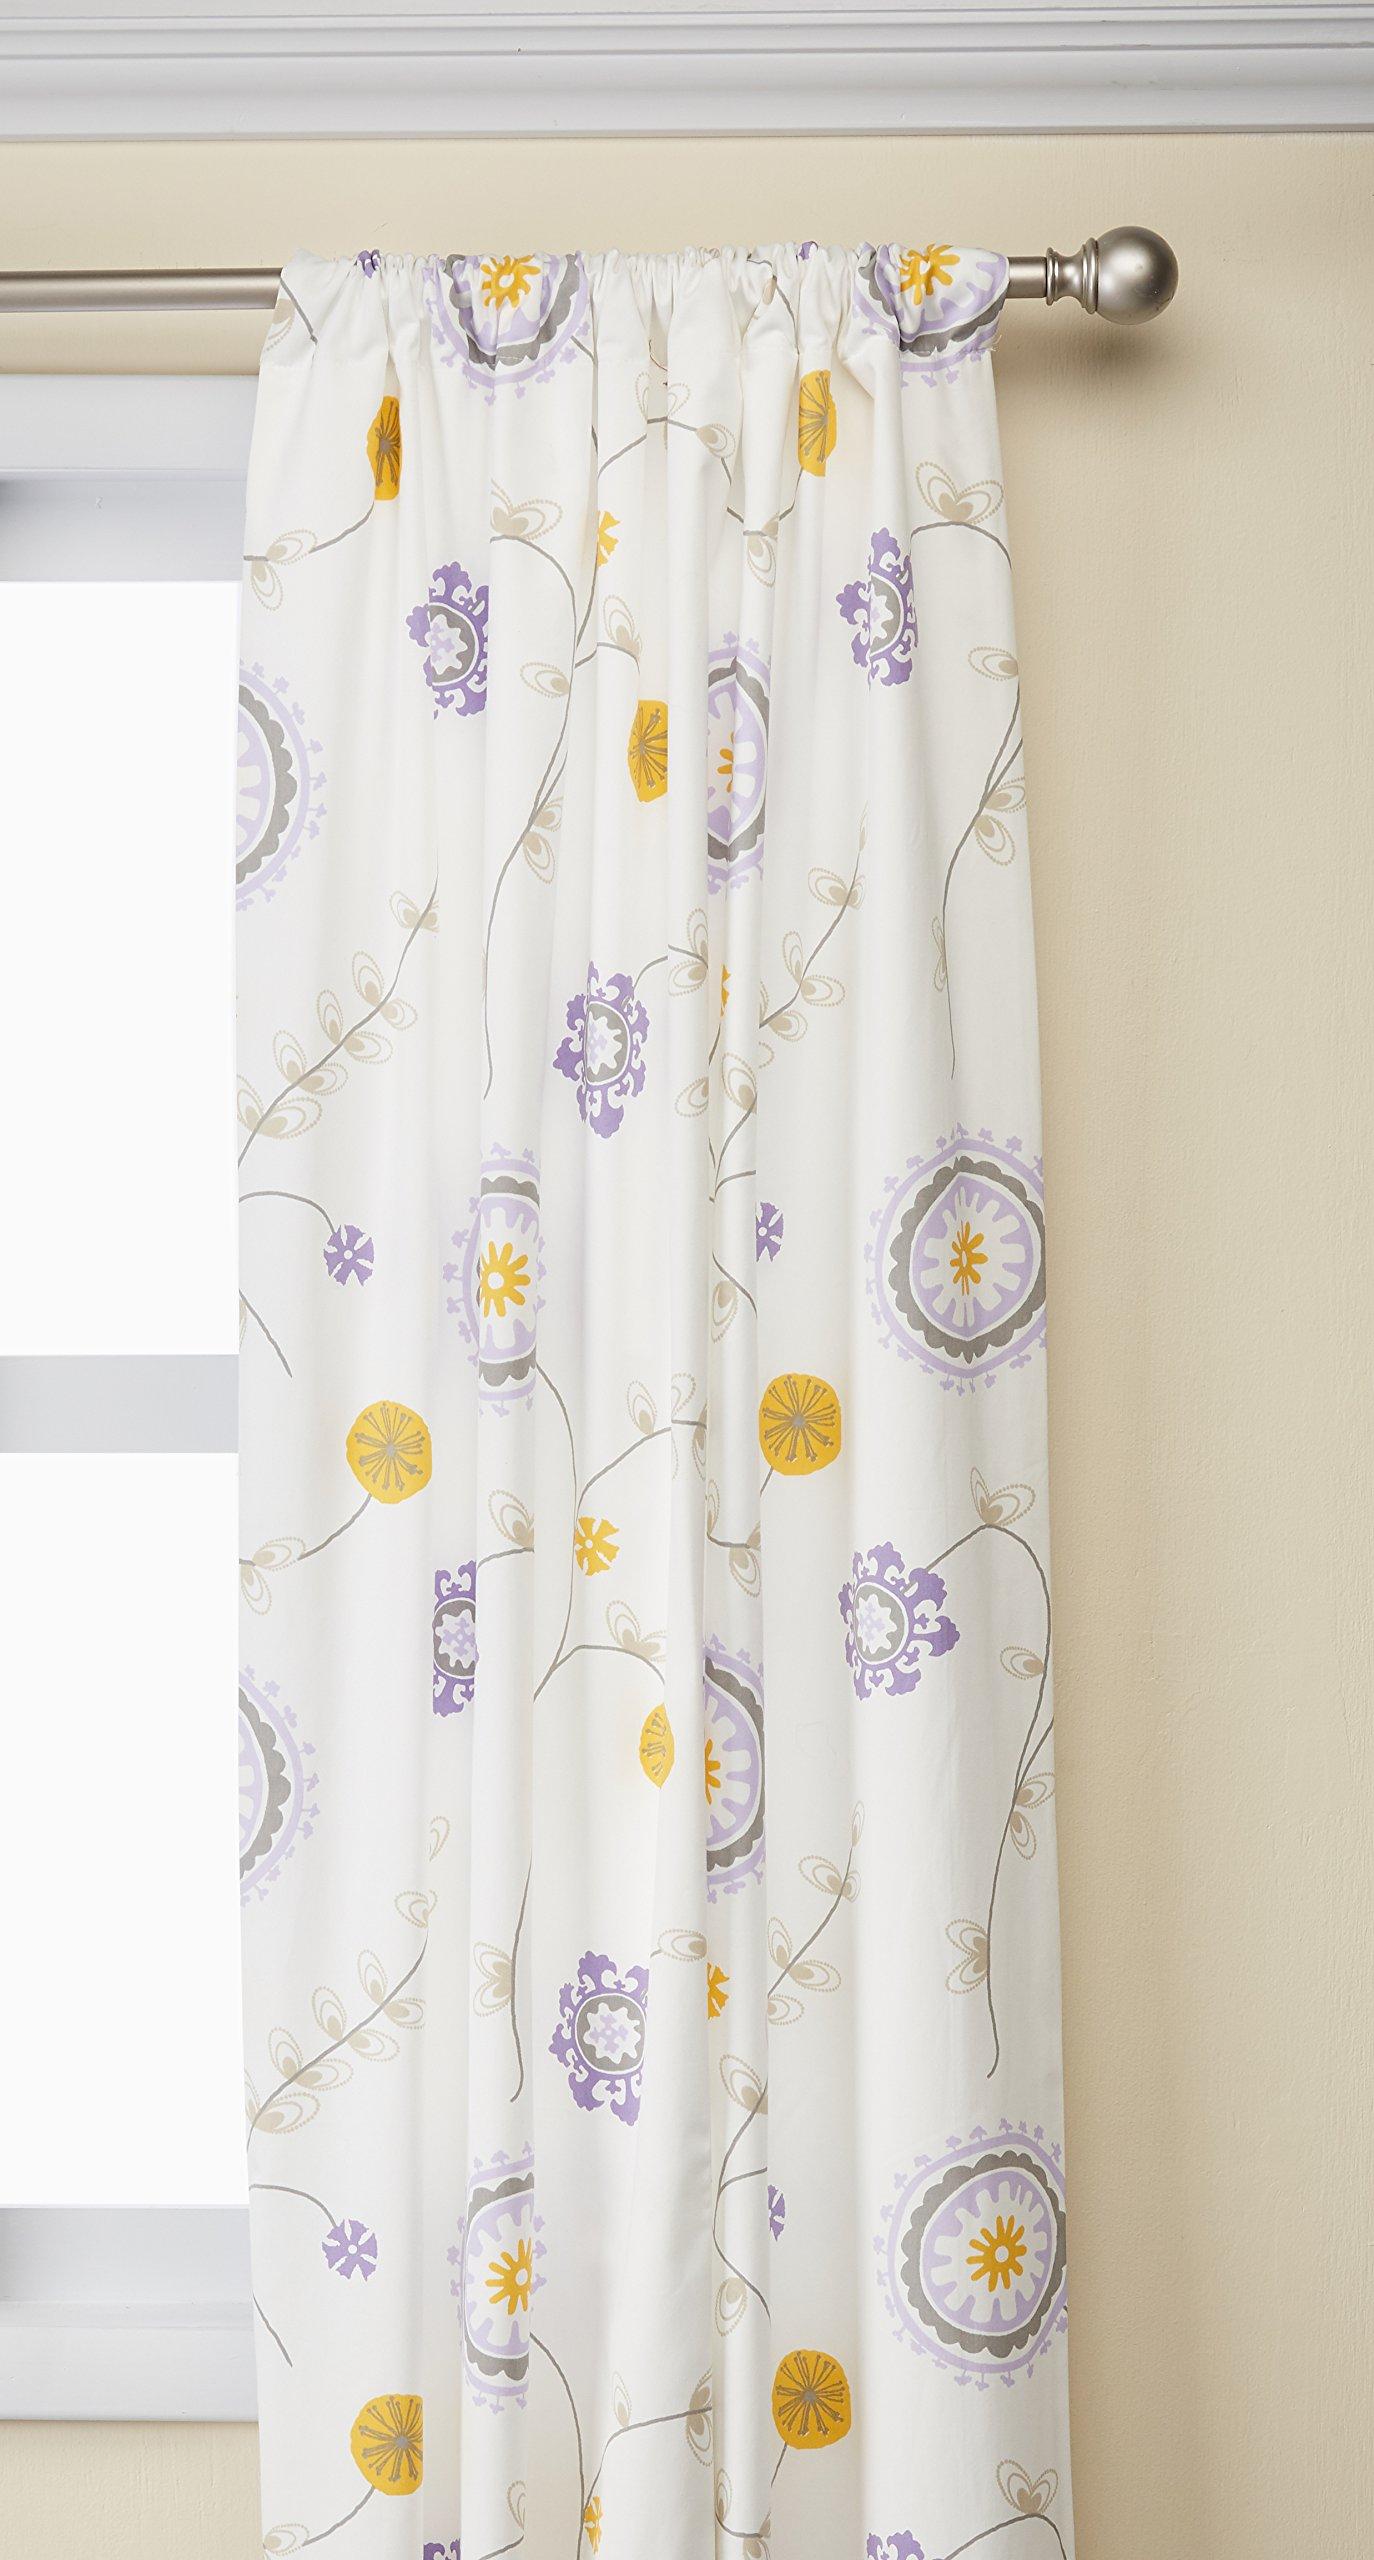 Sweet Potato Fiona Drapery Panels Floral, White/Purple/Yellow